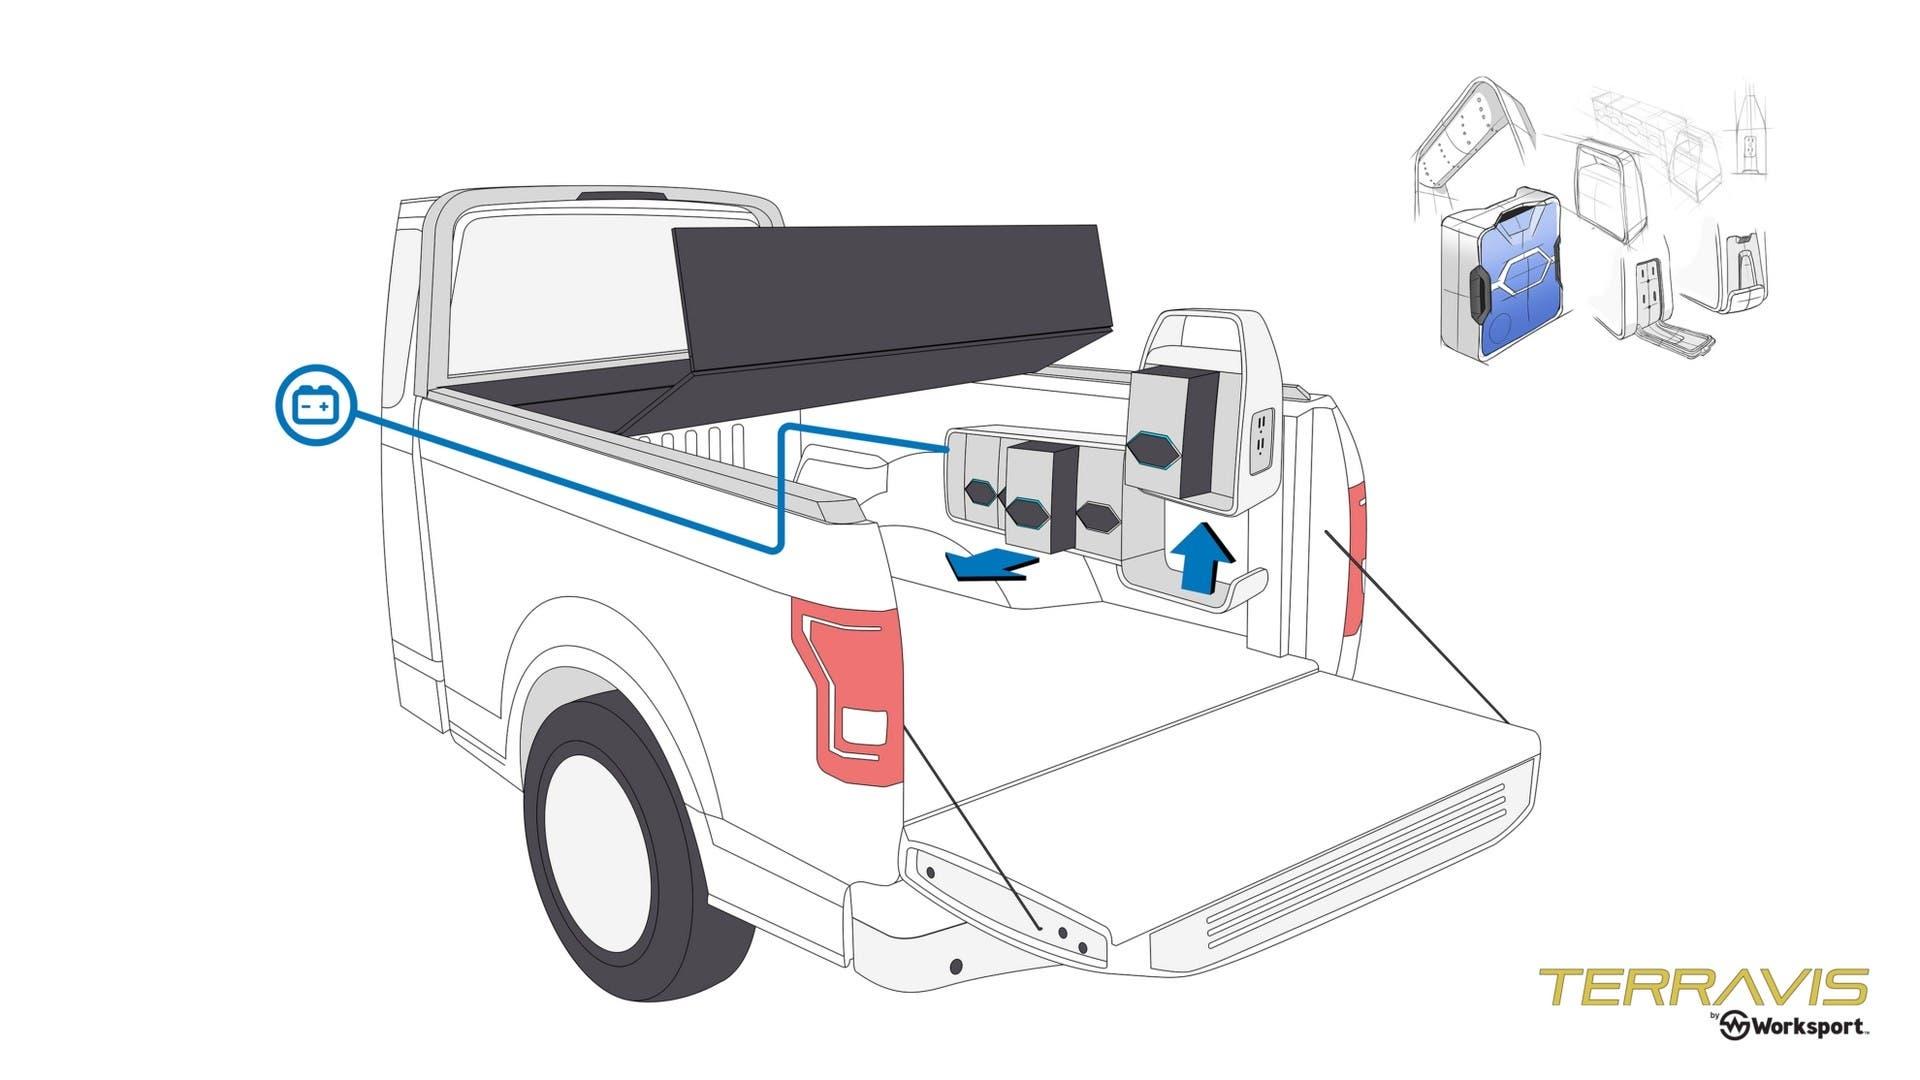 Worksport TerraVis copertura pick-up elettrici